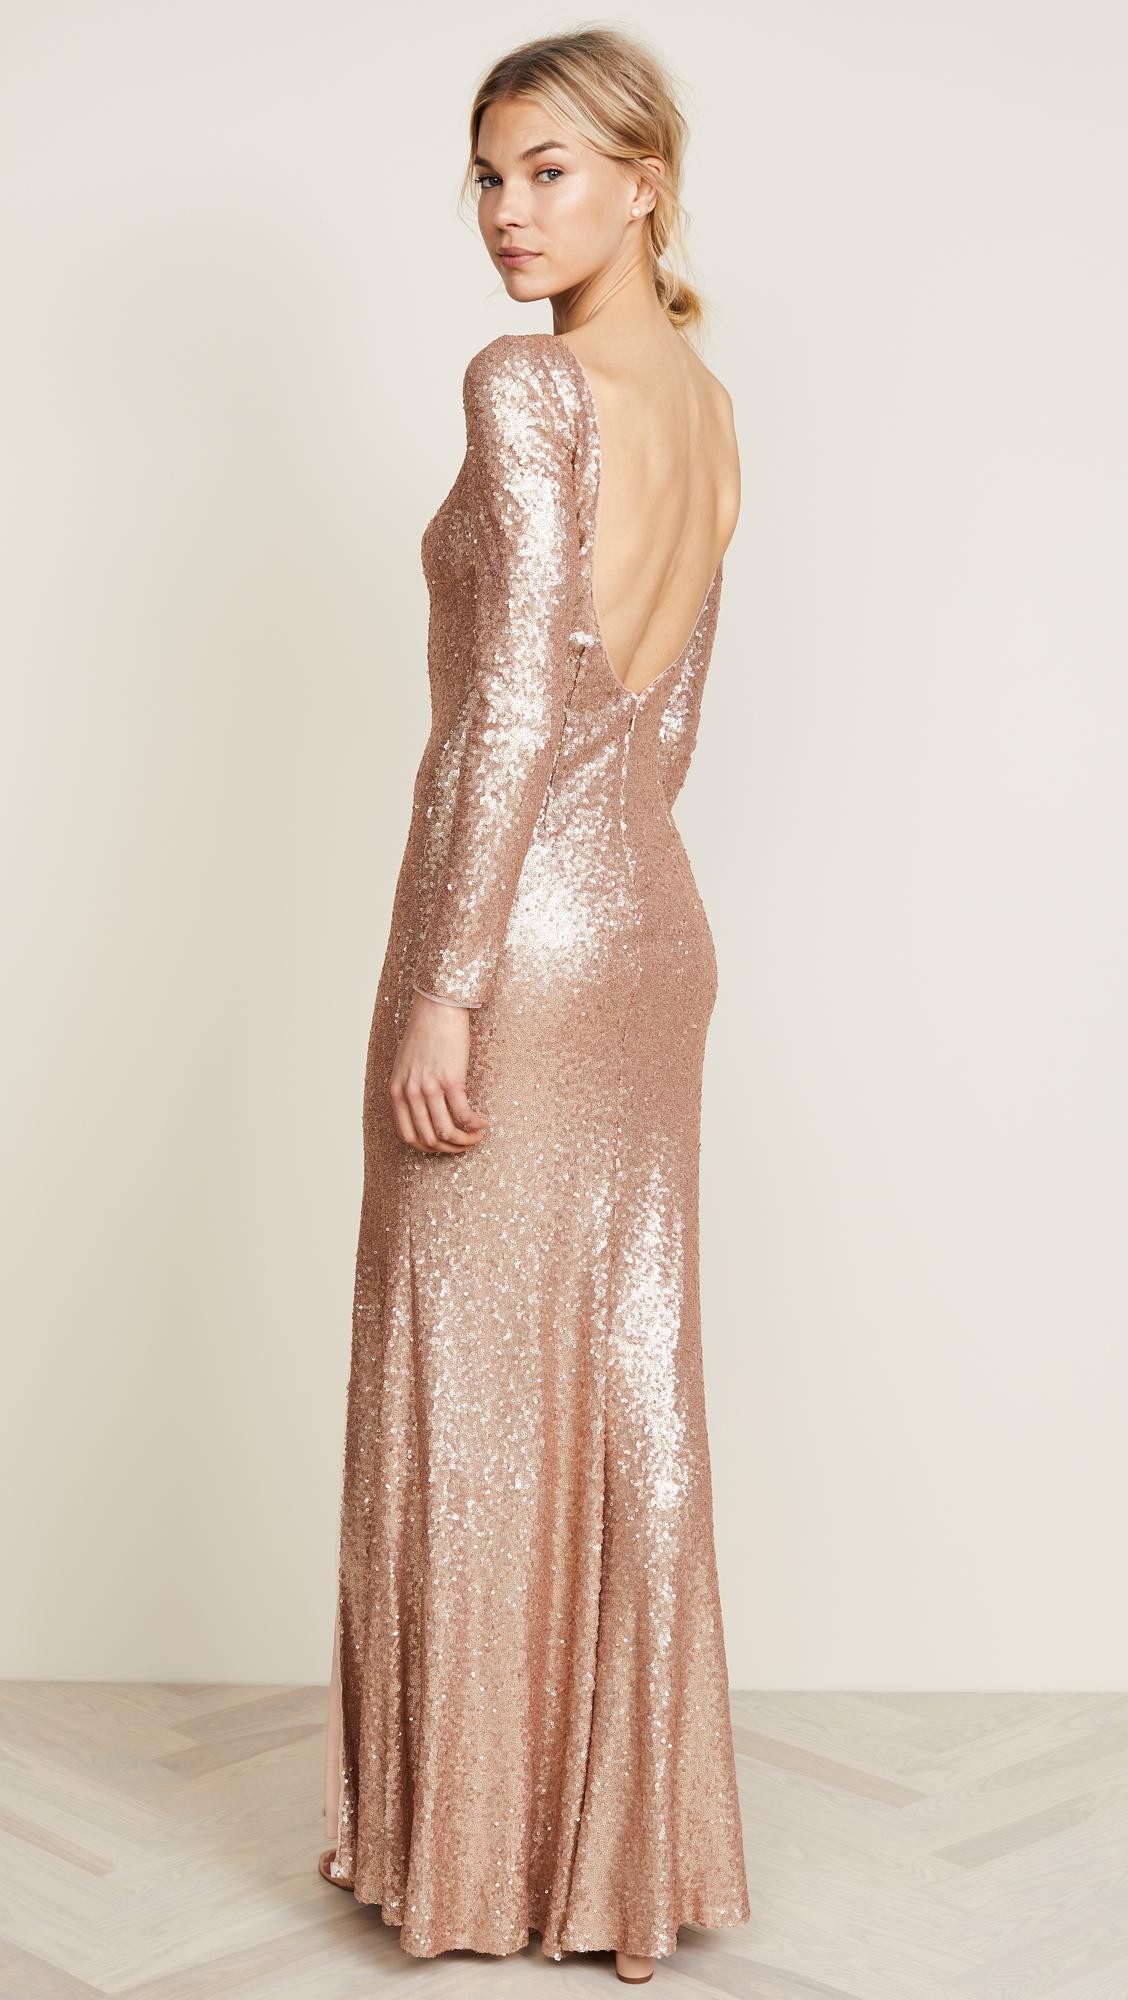 Theia Giselle Bateau Sequin Gown Shopbop